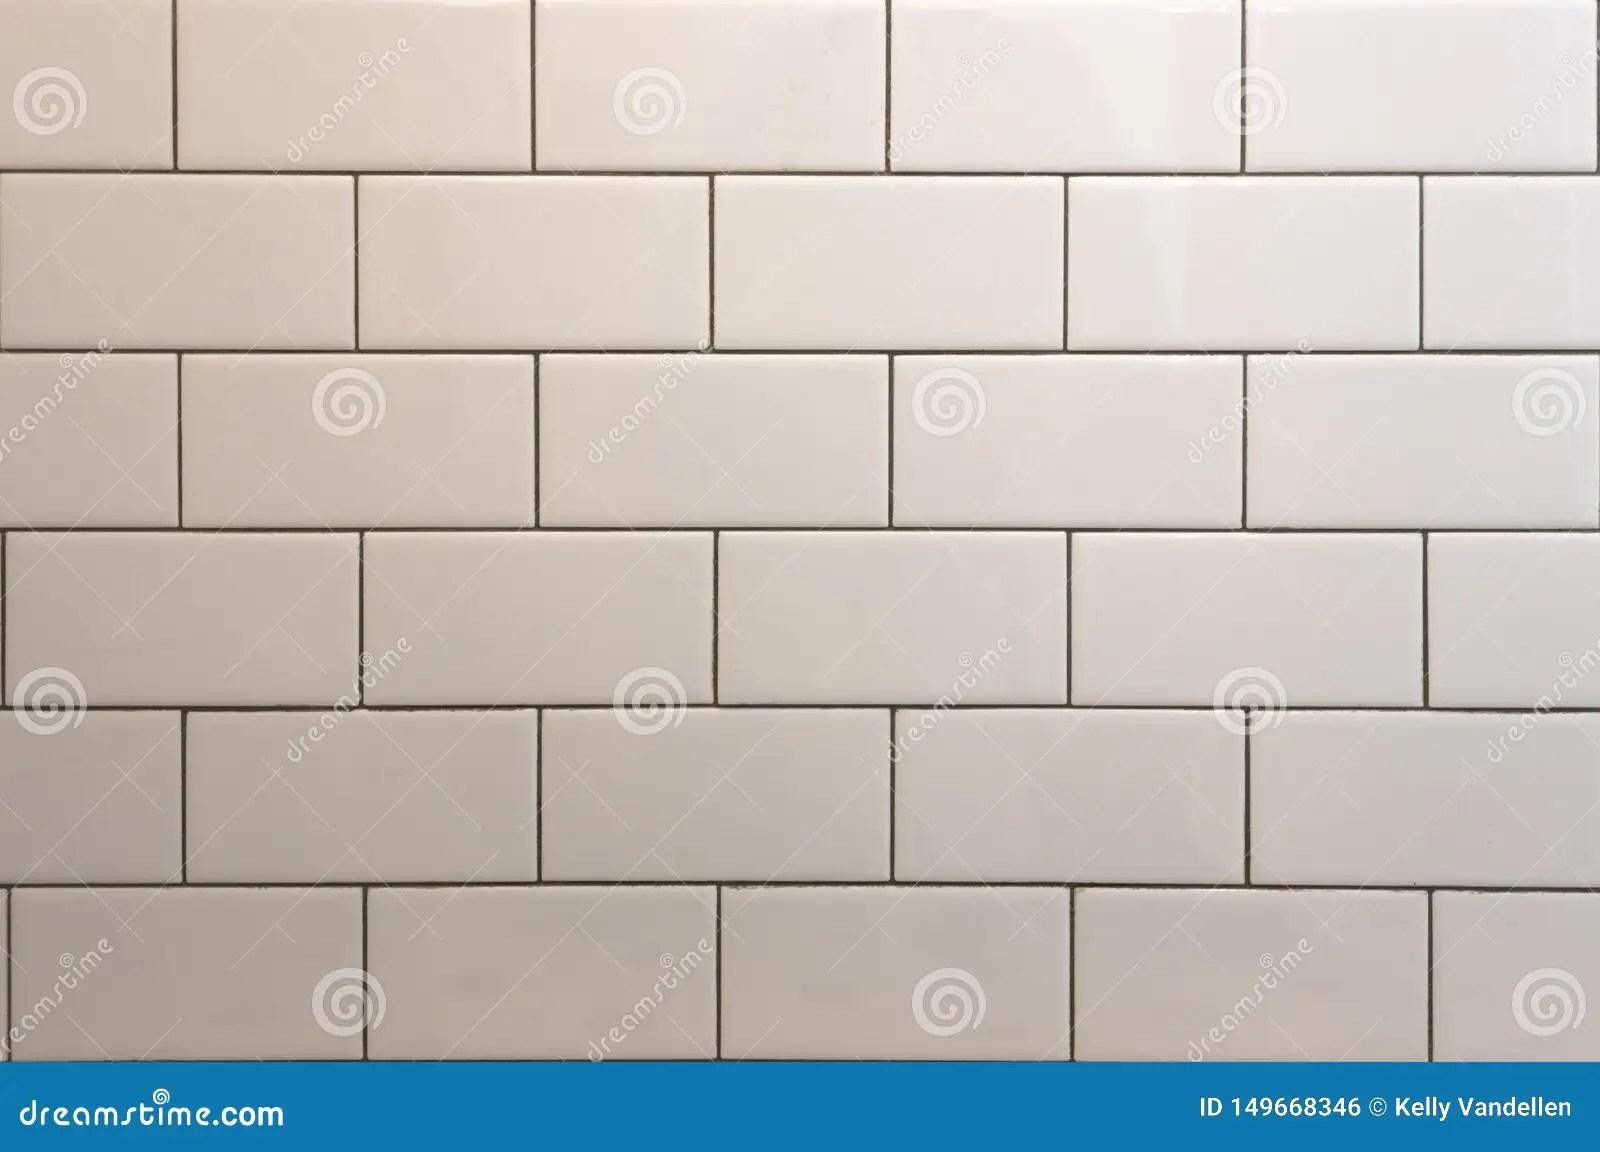 https www dreamstime com white subway tile black grout background image image149668346